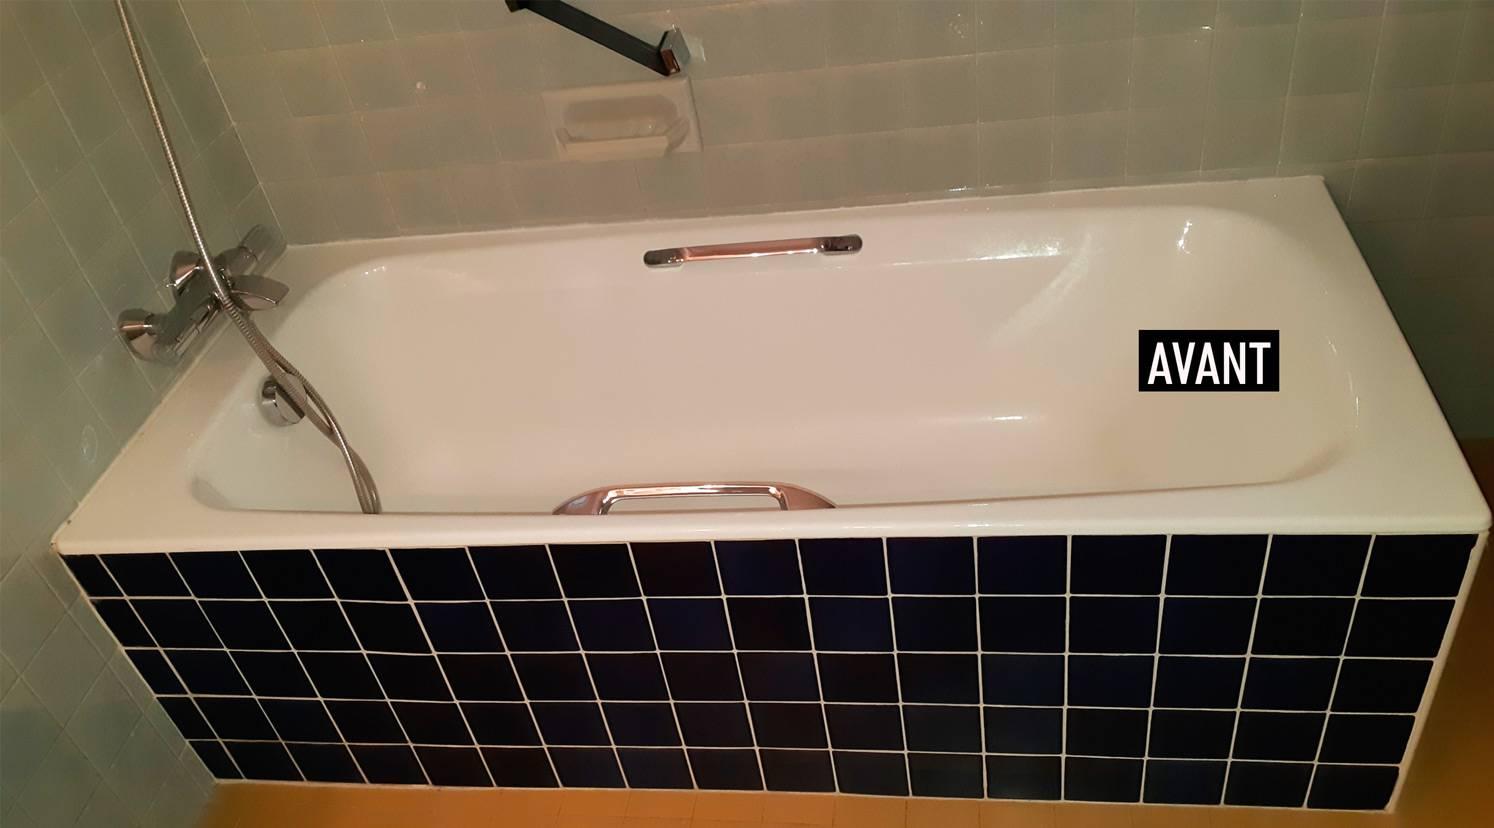 Transformer Une Baignoire En Douche Avec Installation De